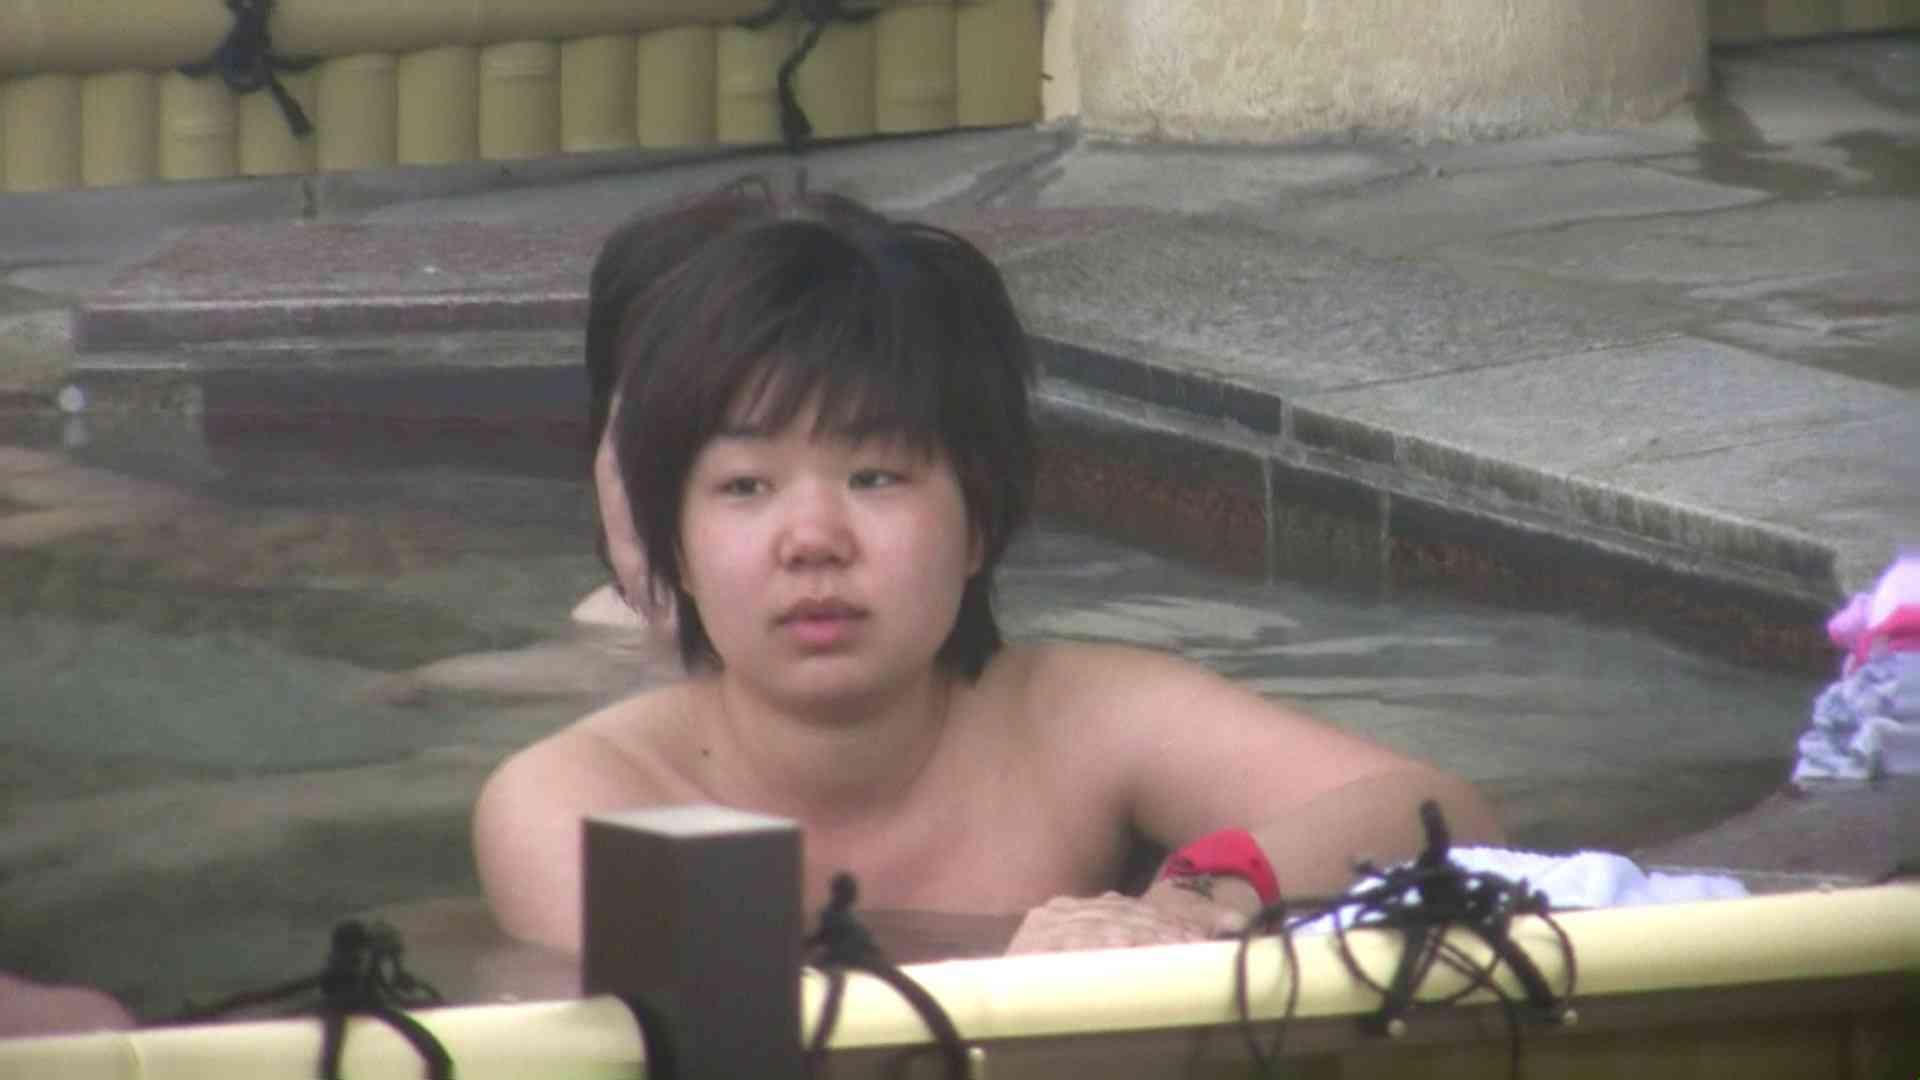 Aquaな露天風呂Vol.53【VIP限定】 露天風呂編   盗撮シリーズ  76PIX 3